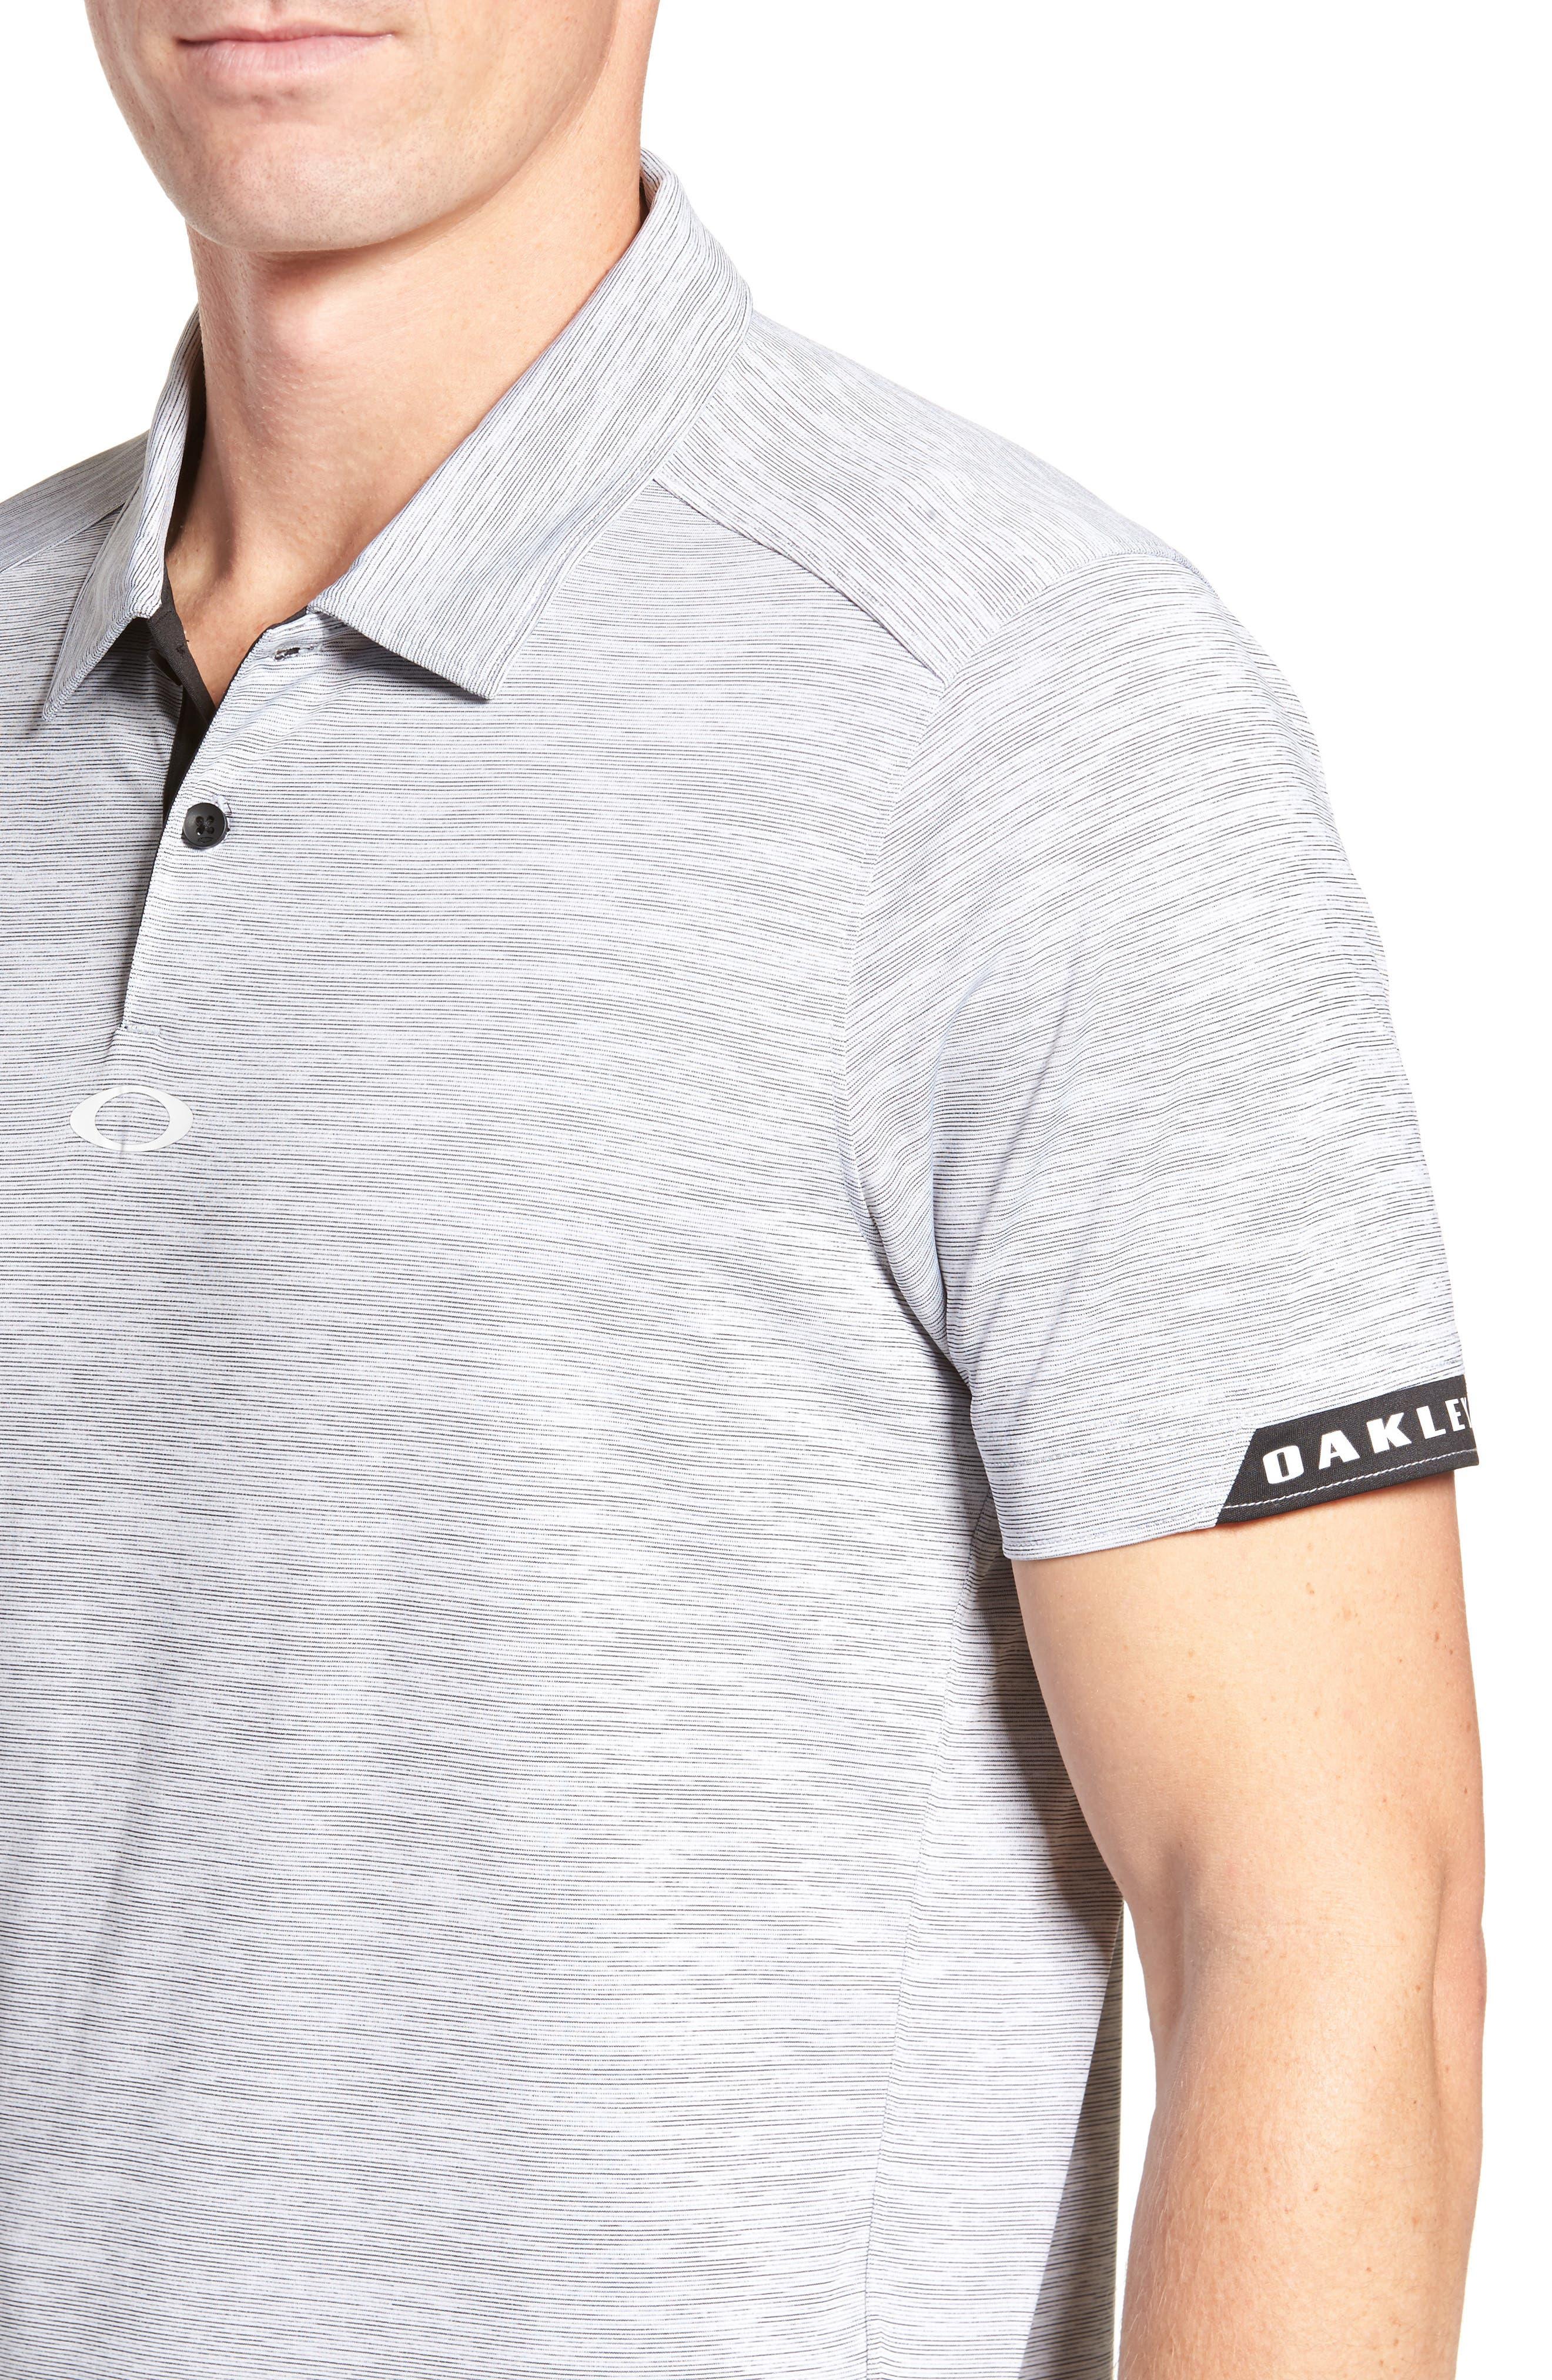 Gravity Polo Shirt,                             Alternate thumbnail 4, color,                             BLACKOUT